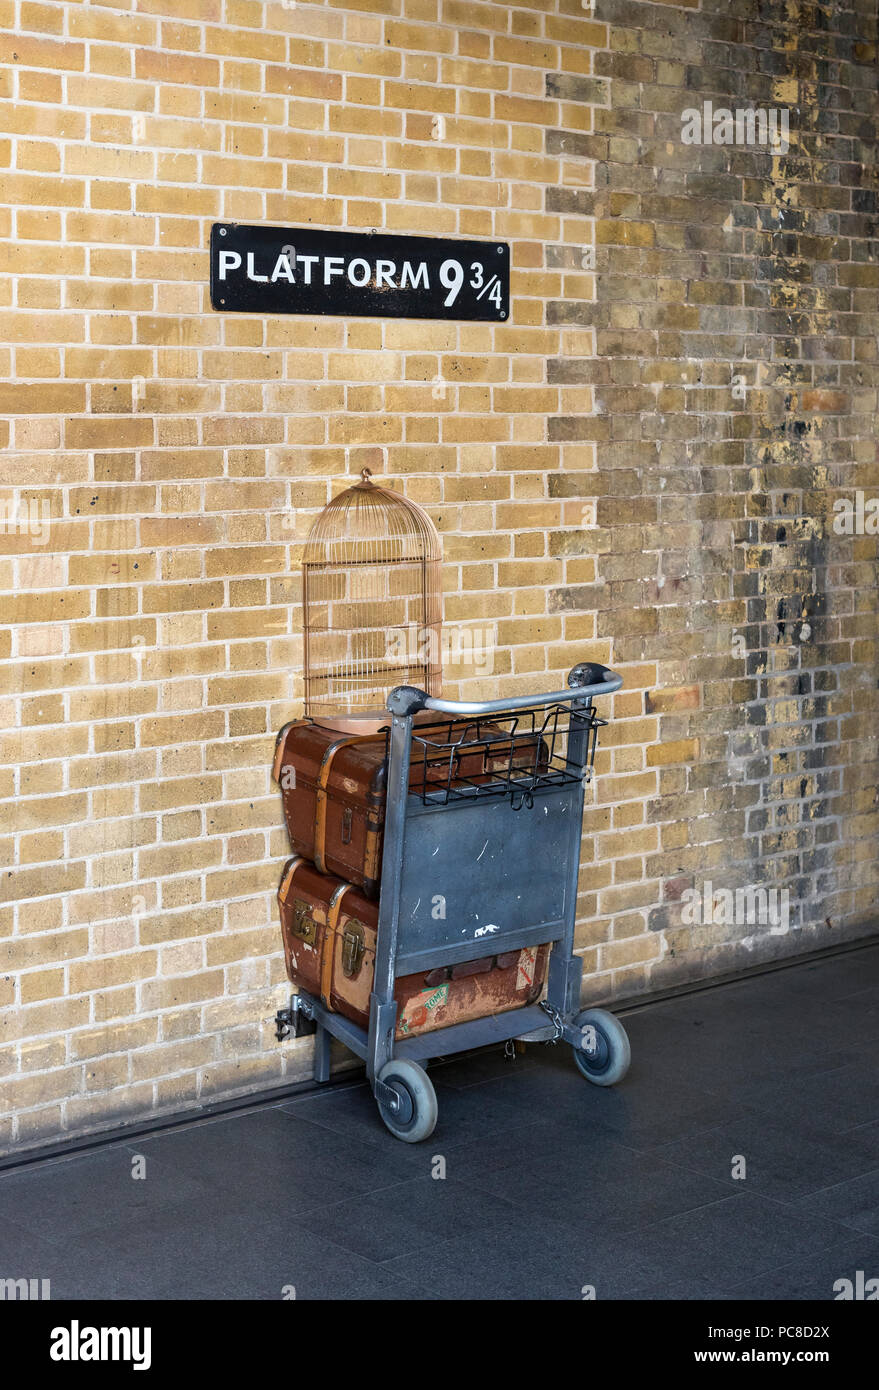 Santo Sepolcro di Gerusalemme Platform-9-at-london-kings-cross-railway-station-england-uk-PC8D2X